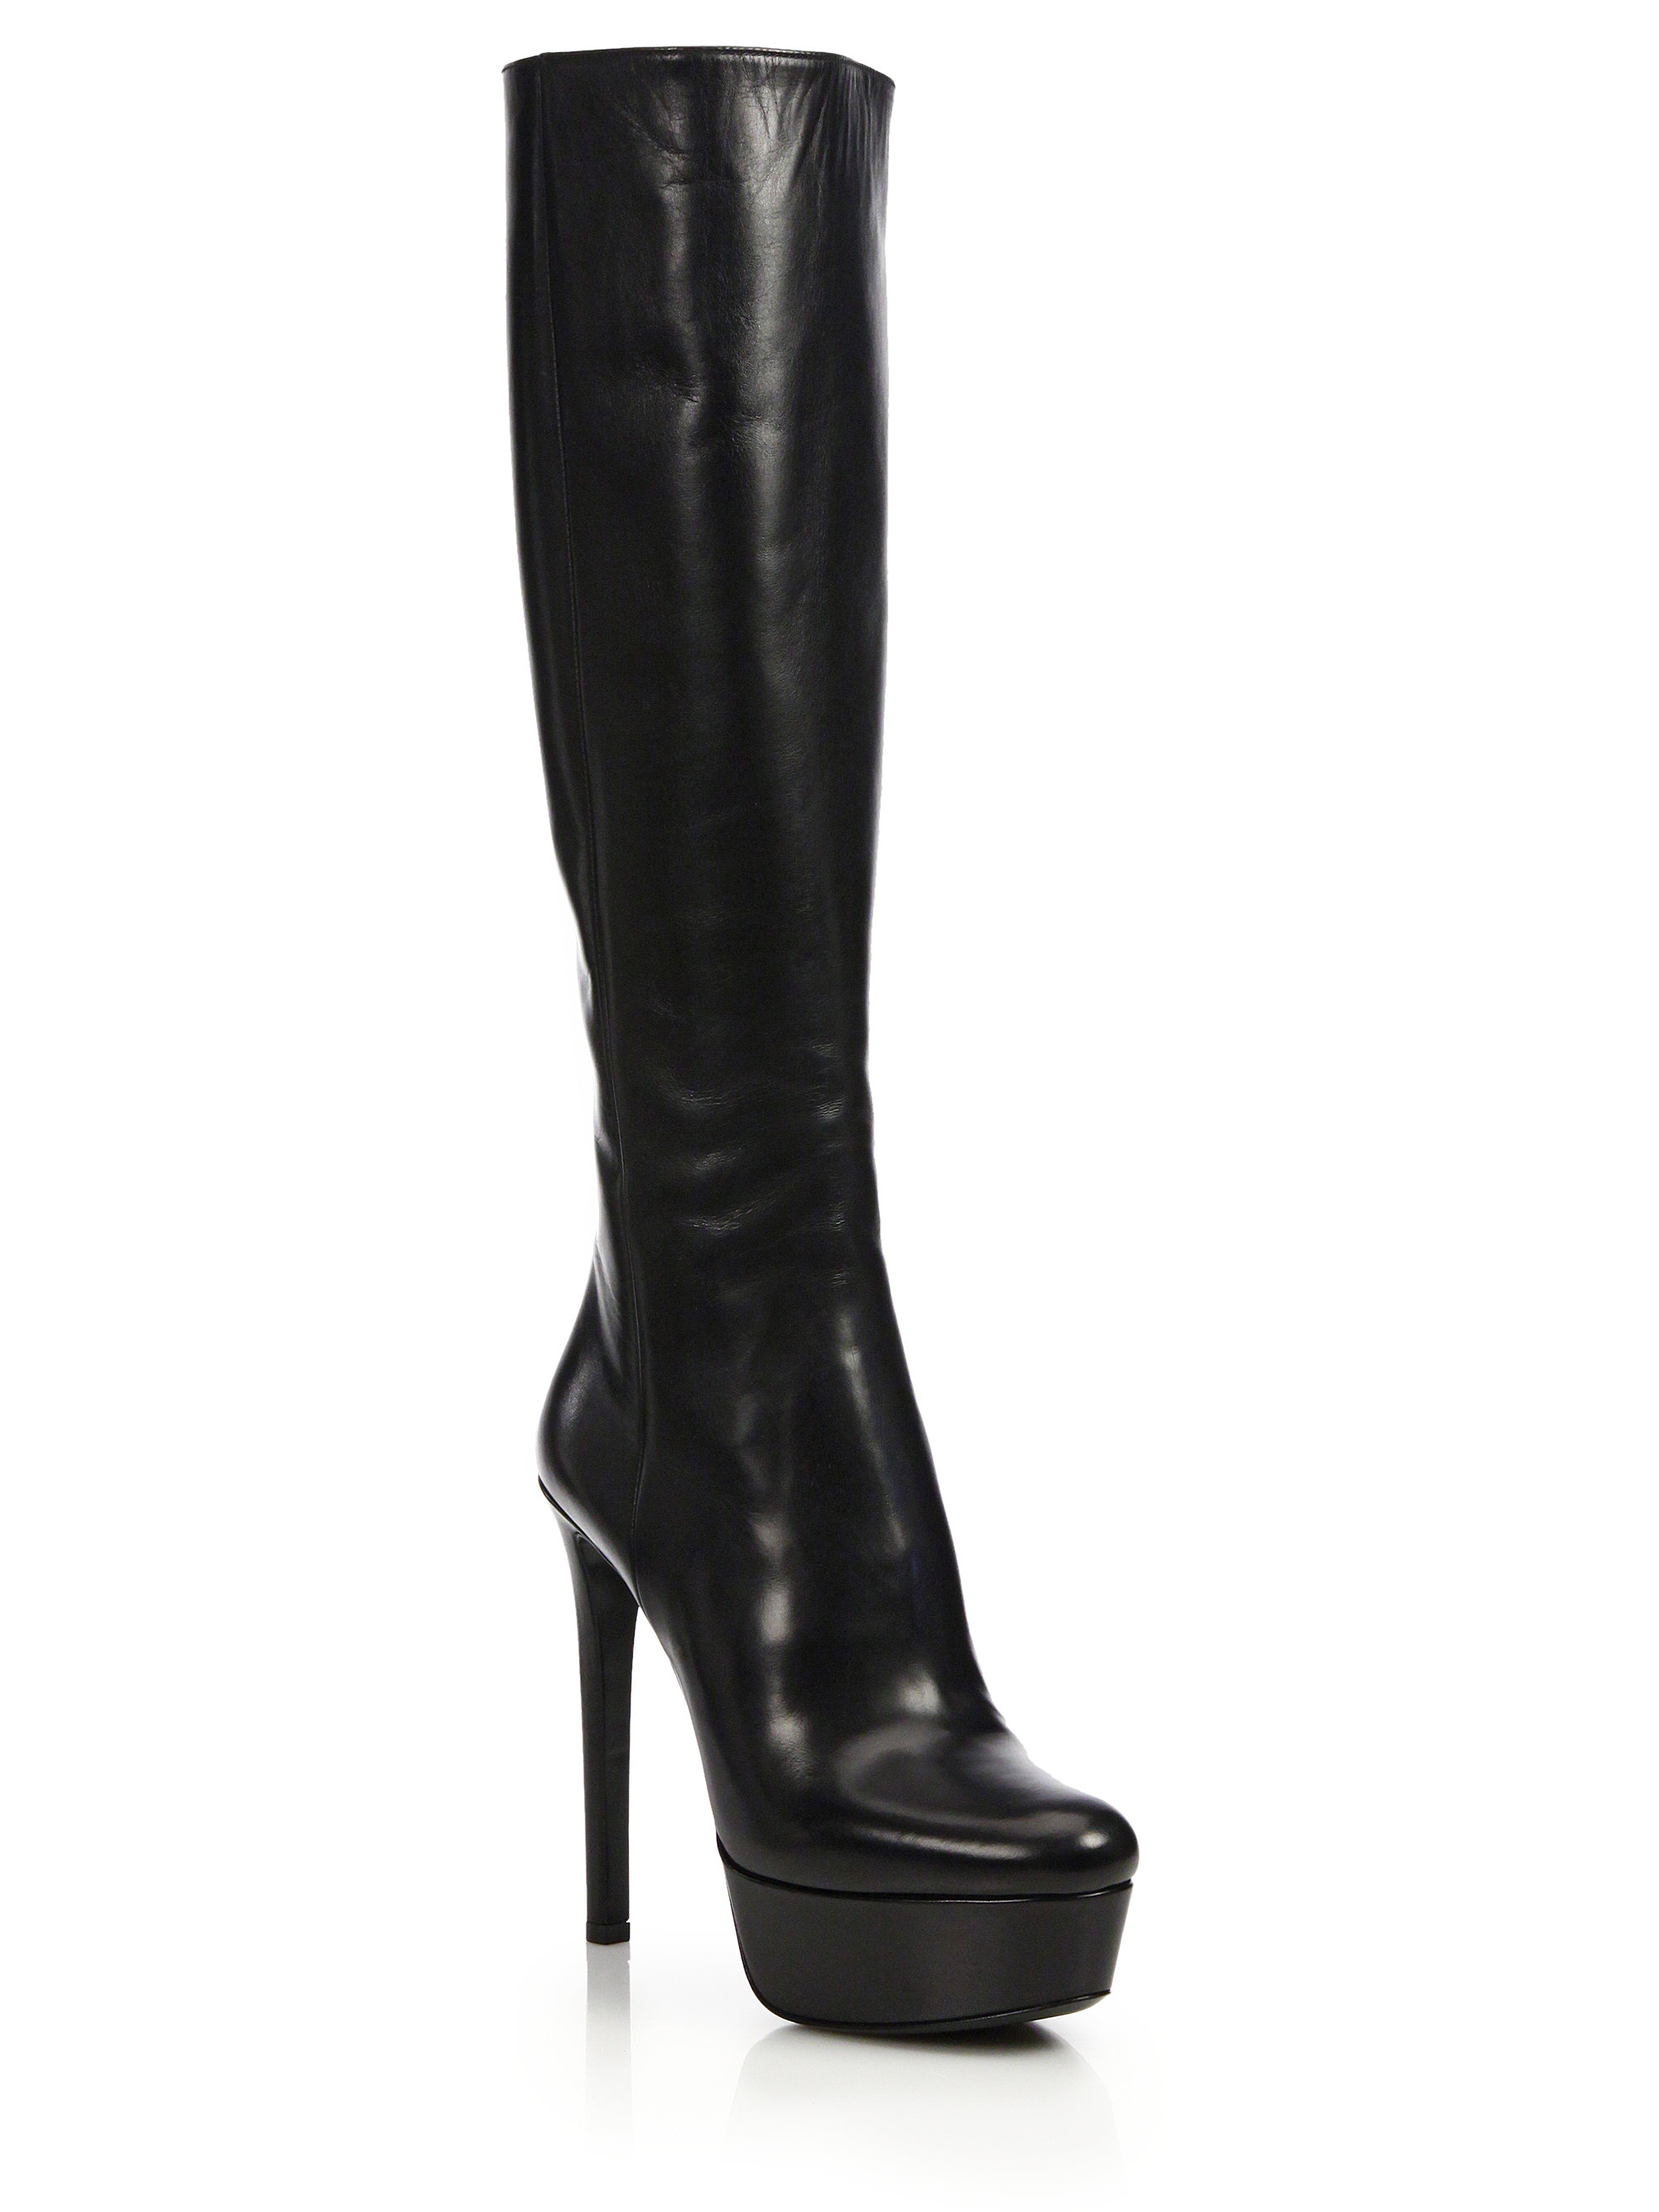 Prada Leather Knee-high Platform Boots in Black | Lyst